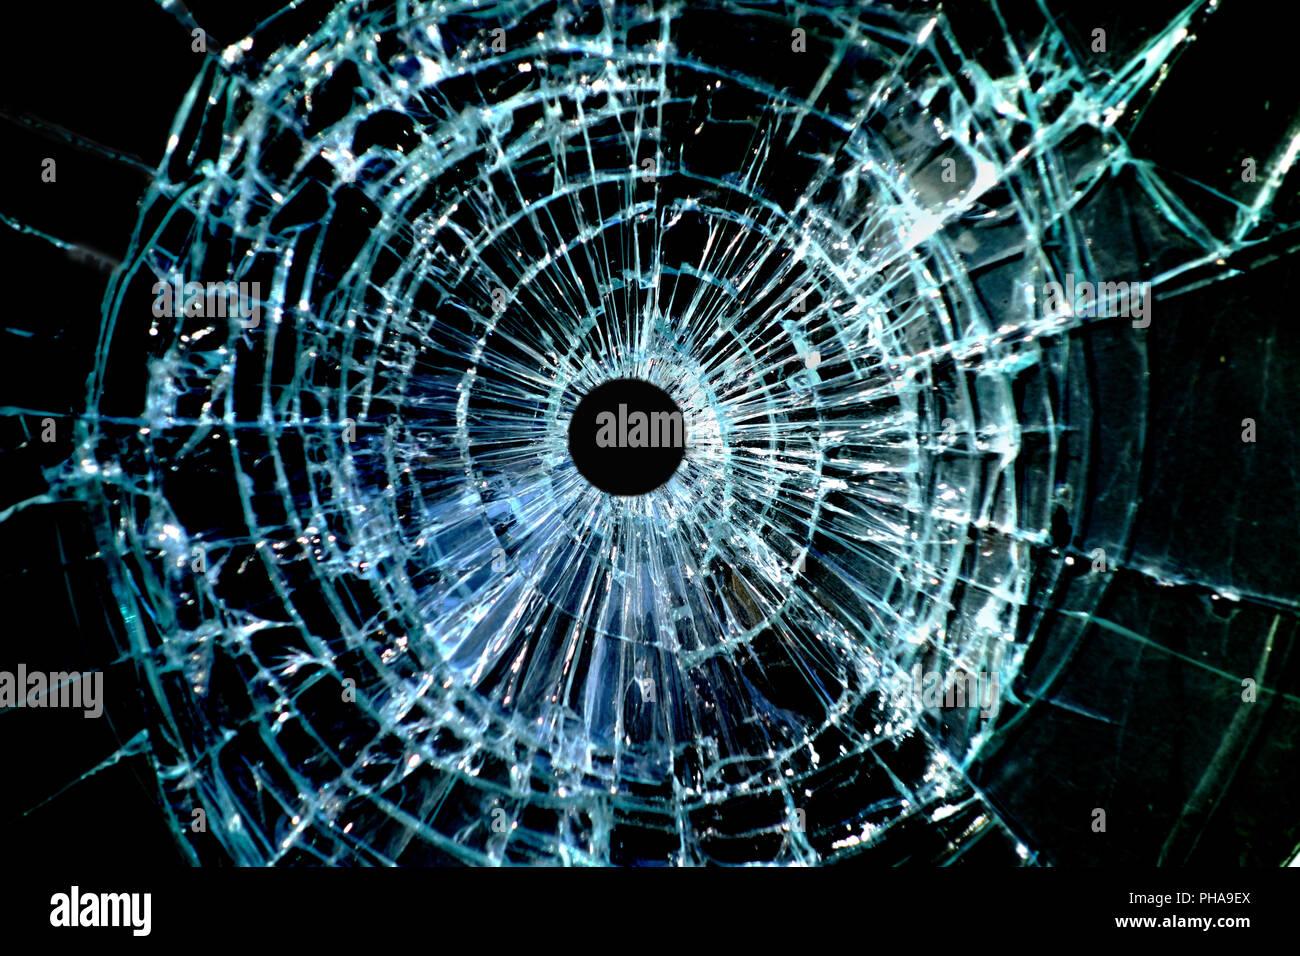 Bullet hole window - Stock Image